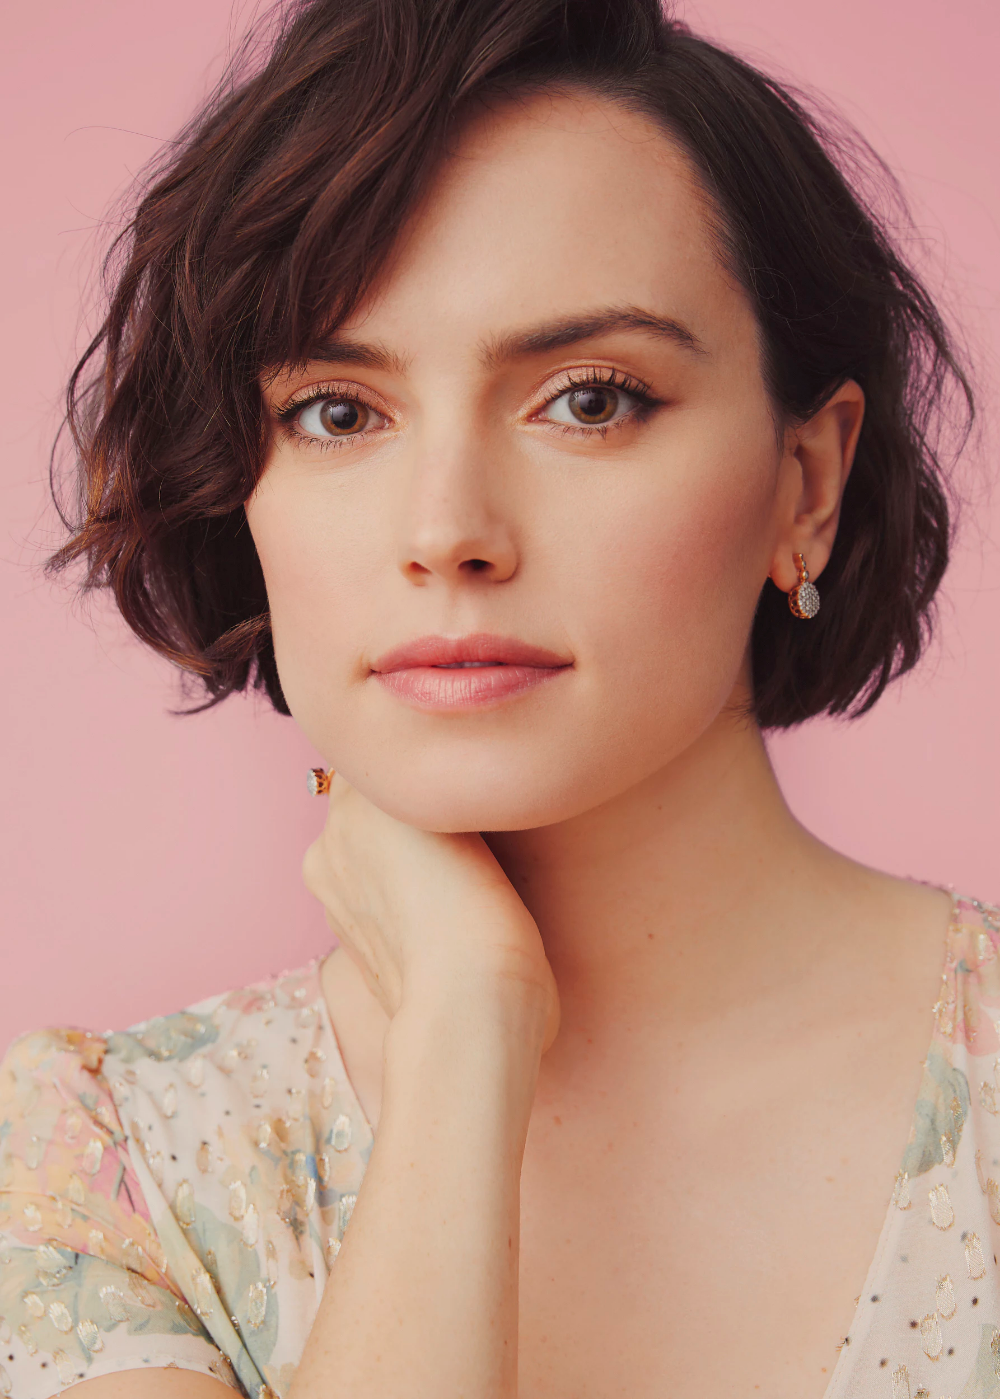 Pin By Bridget Badore On Work Inspiration Daisy Ridley Beauty Celebrities